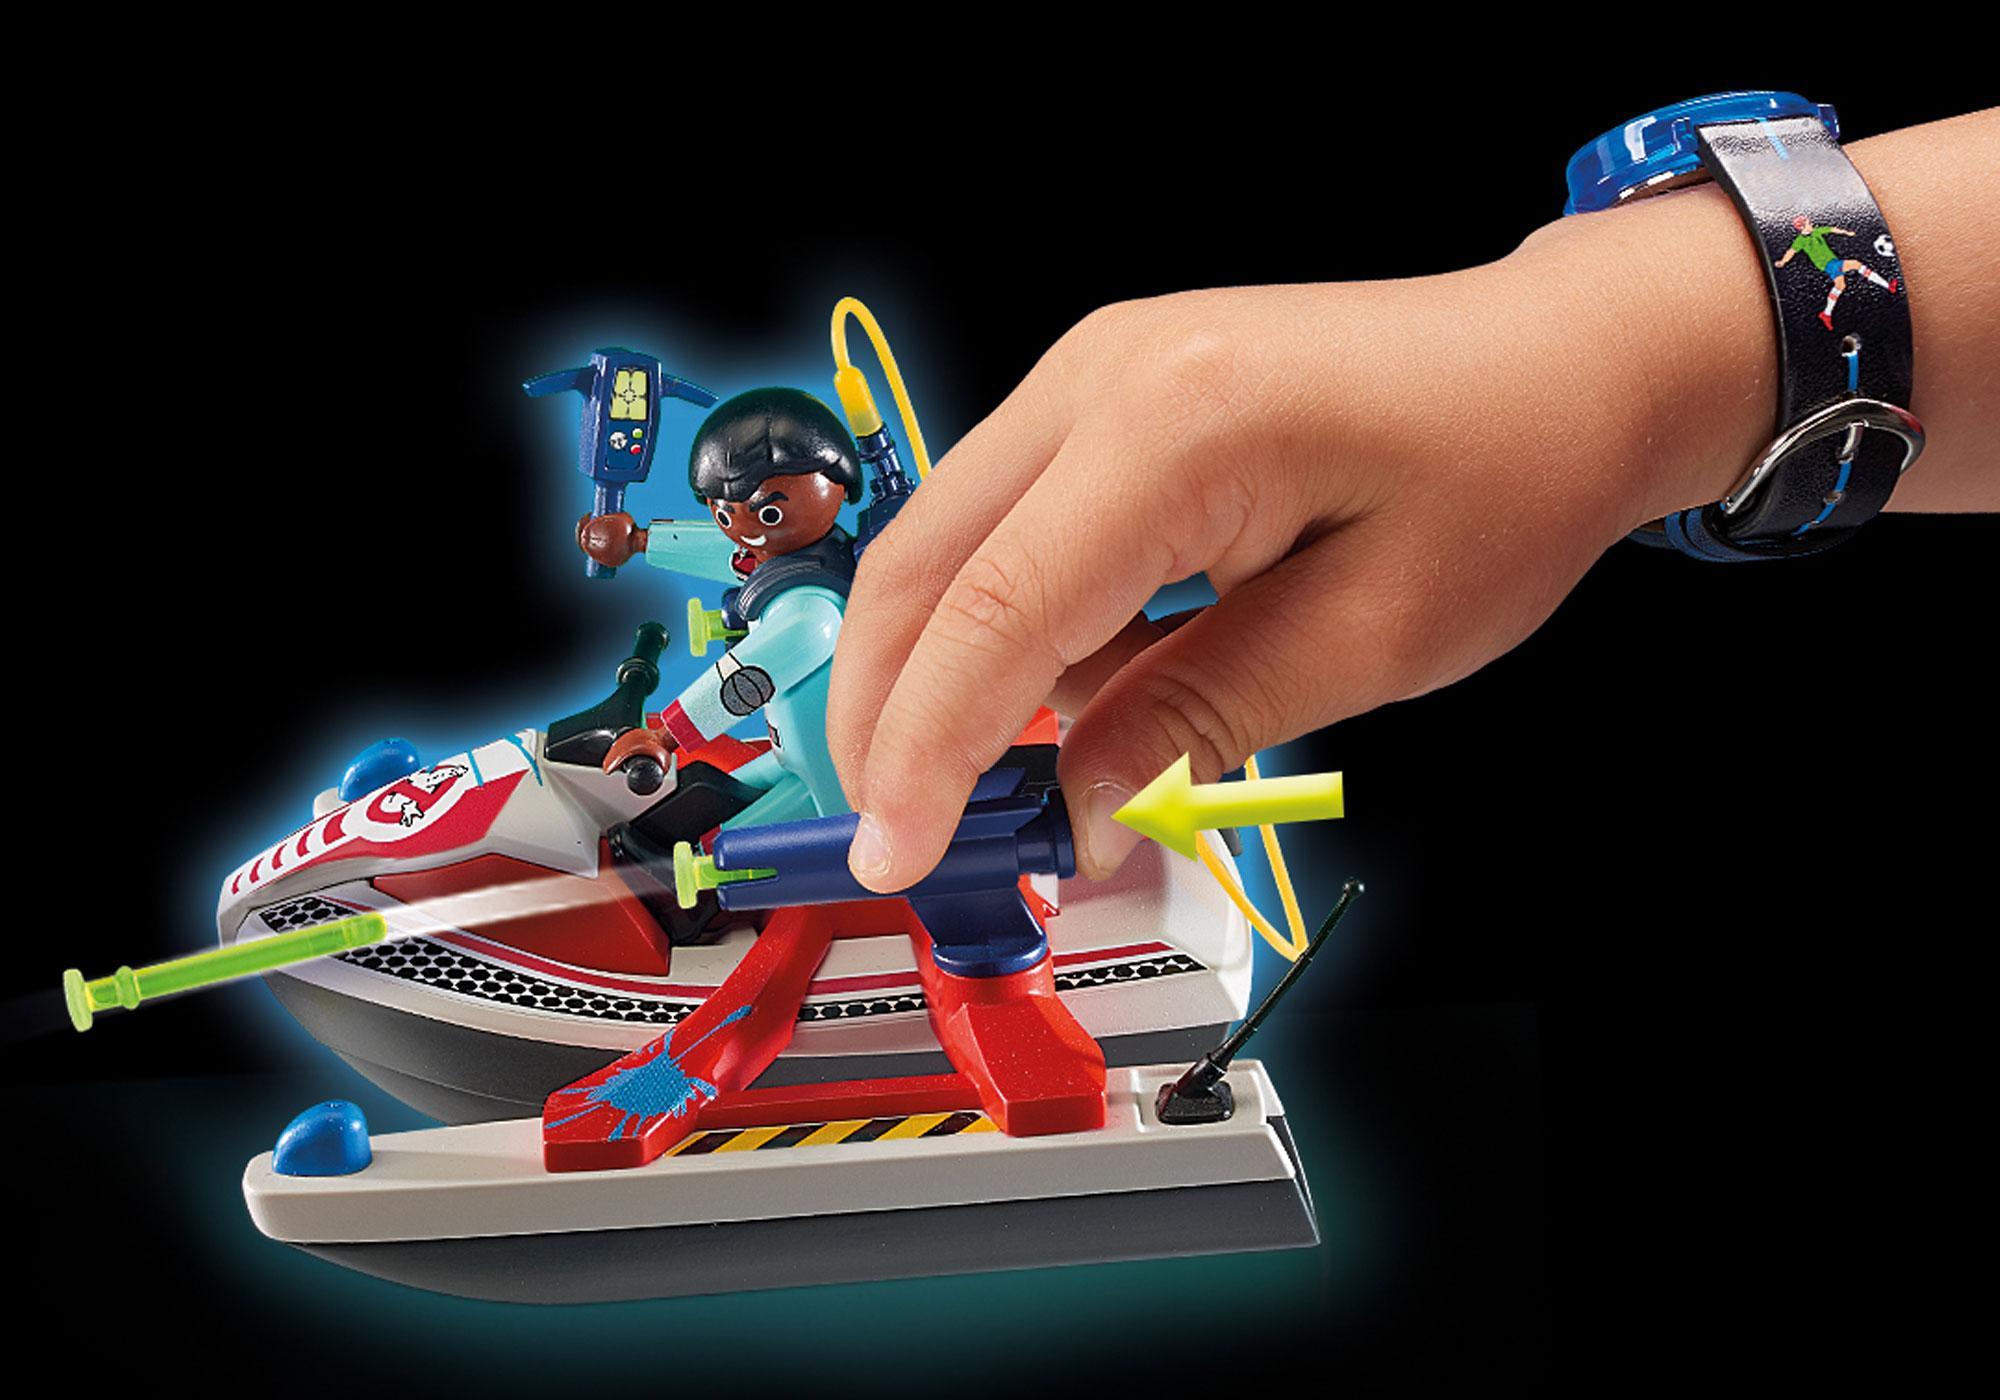 http://media.playmobil.com/i/playmobil/9387_product_extra1/Zeddemore mit Aqua Scooter